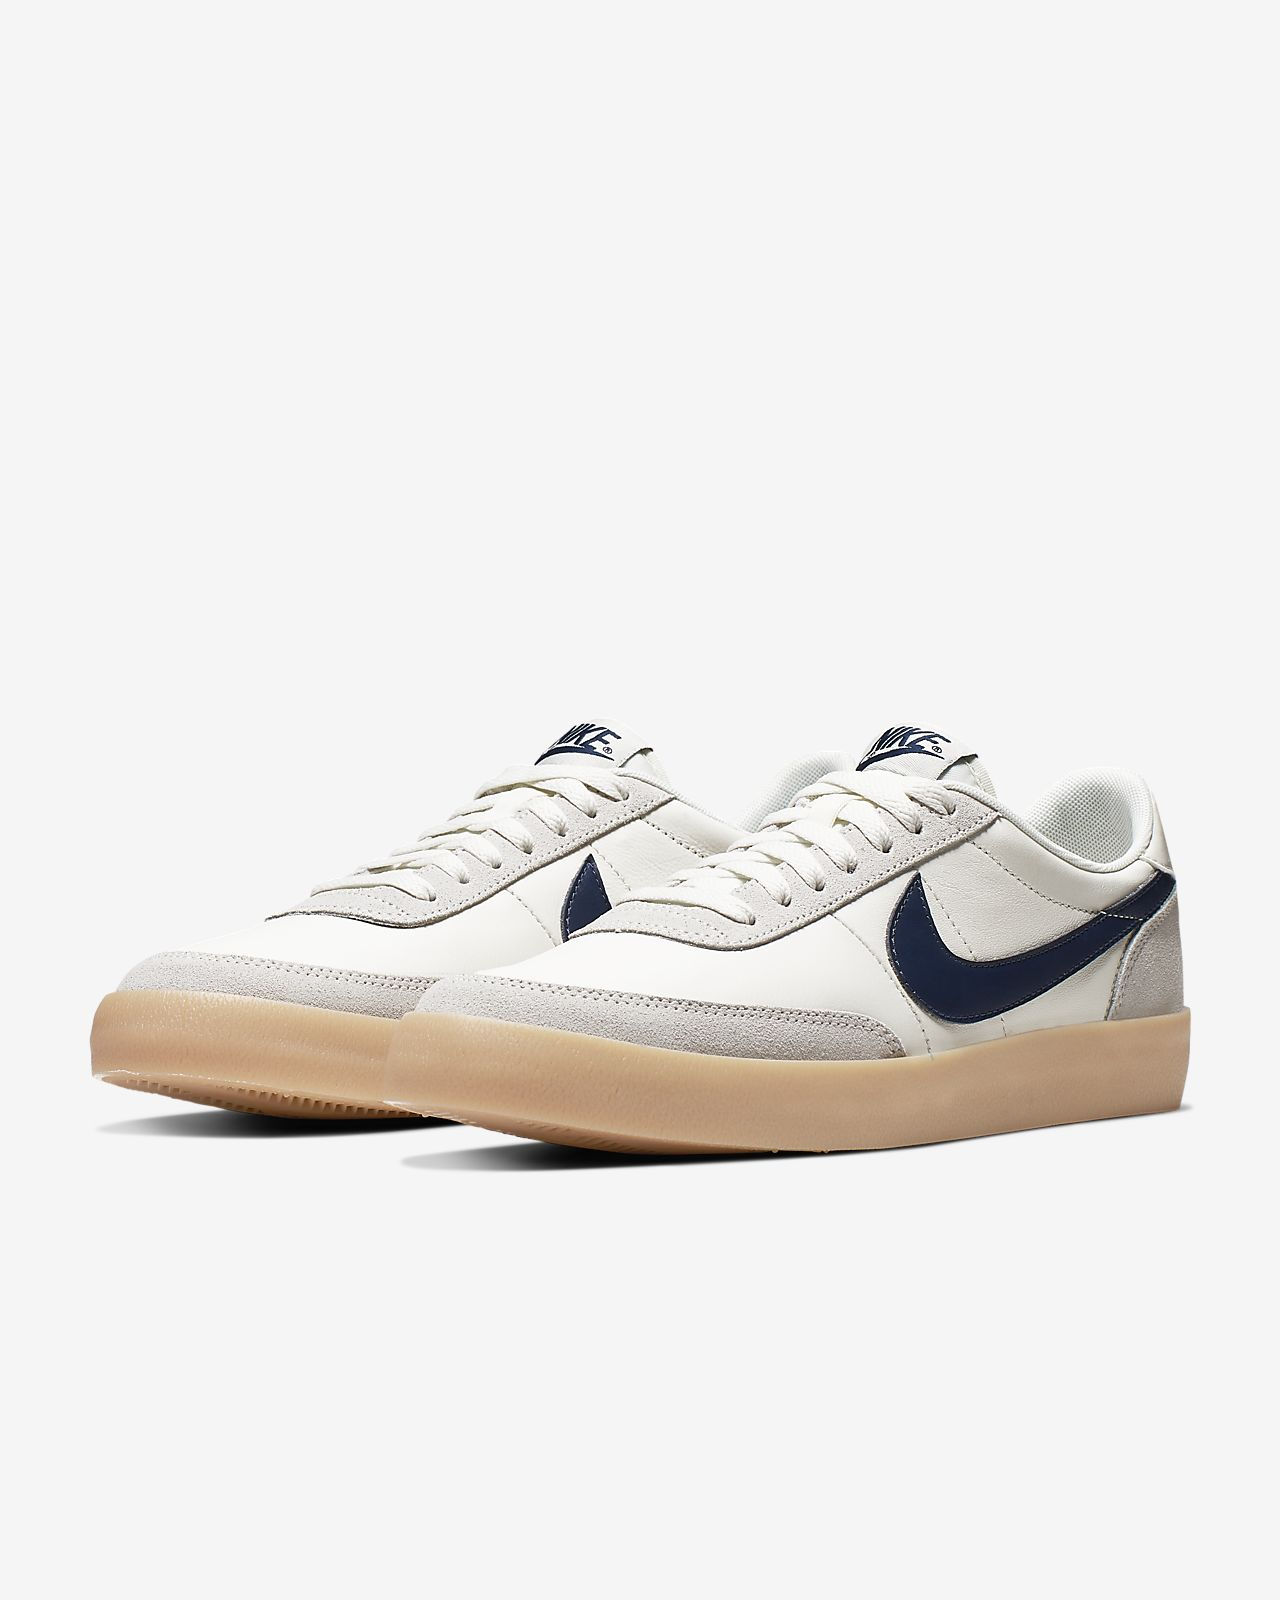 32e42dd68e8 Nike Killshot 2 Men's Shoe